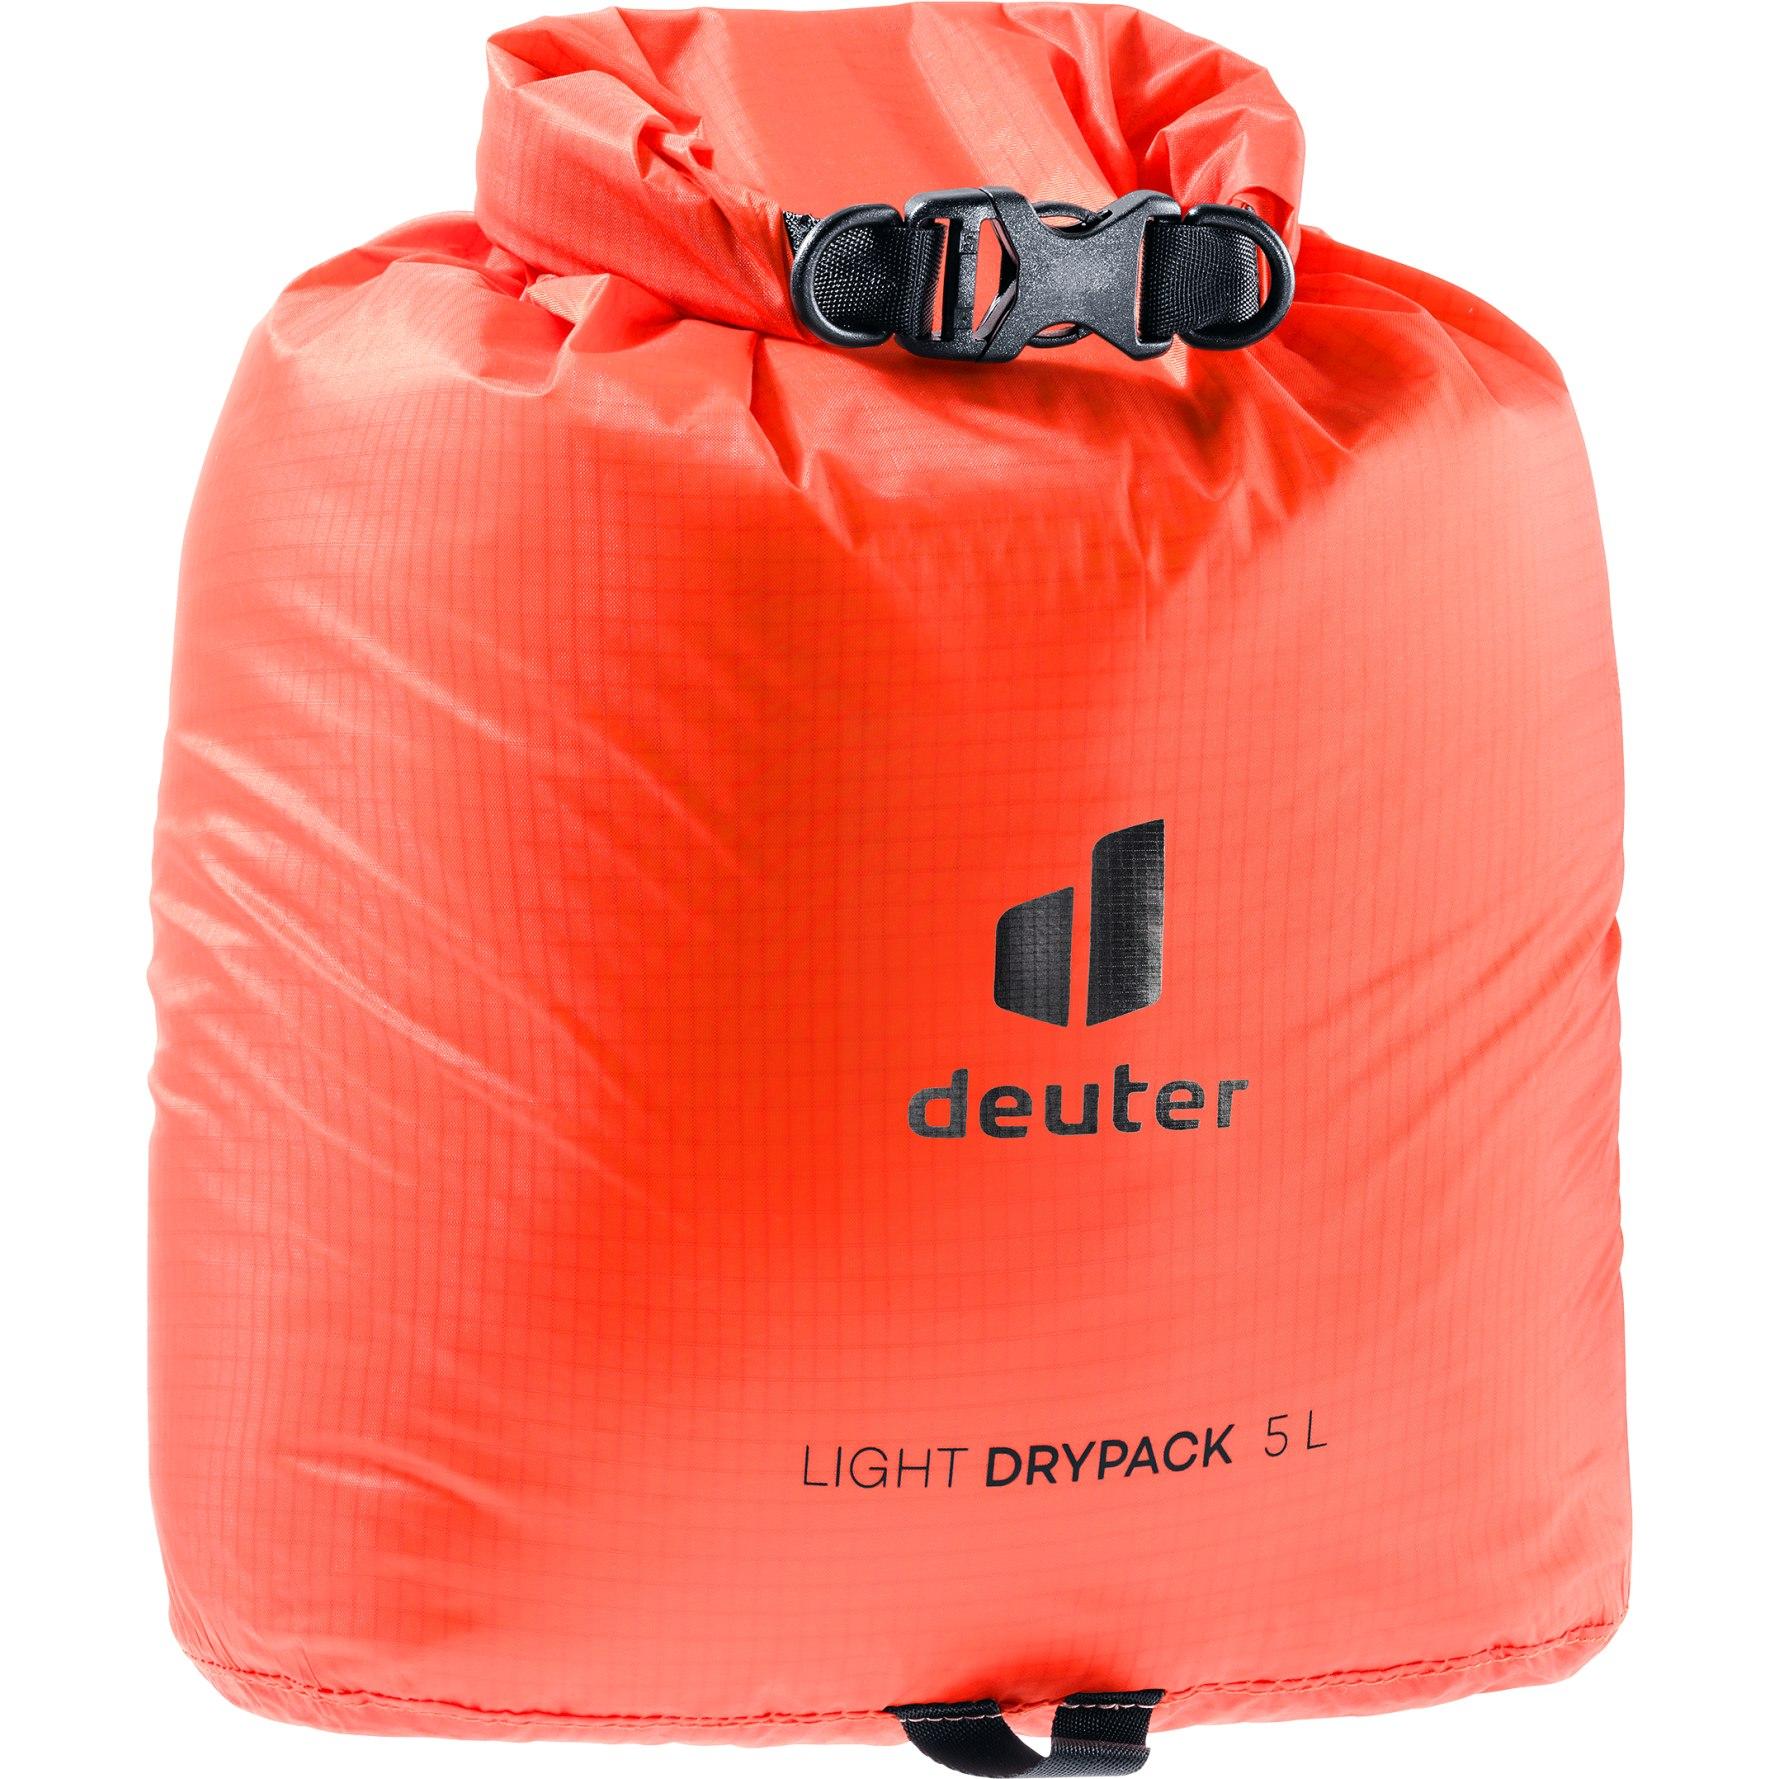 Deuter Light Drypack 5l - papaya